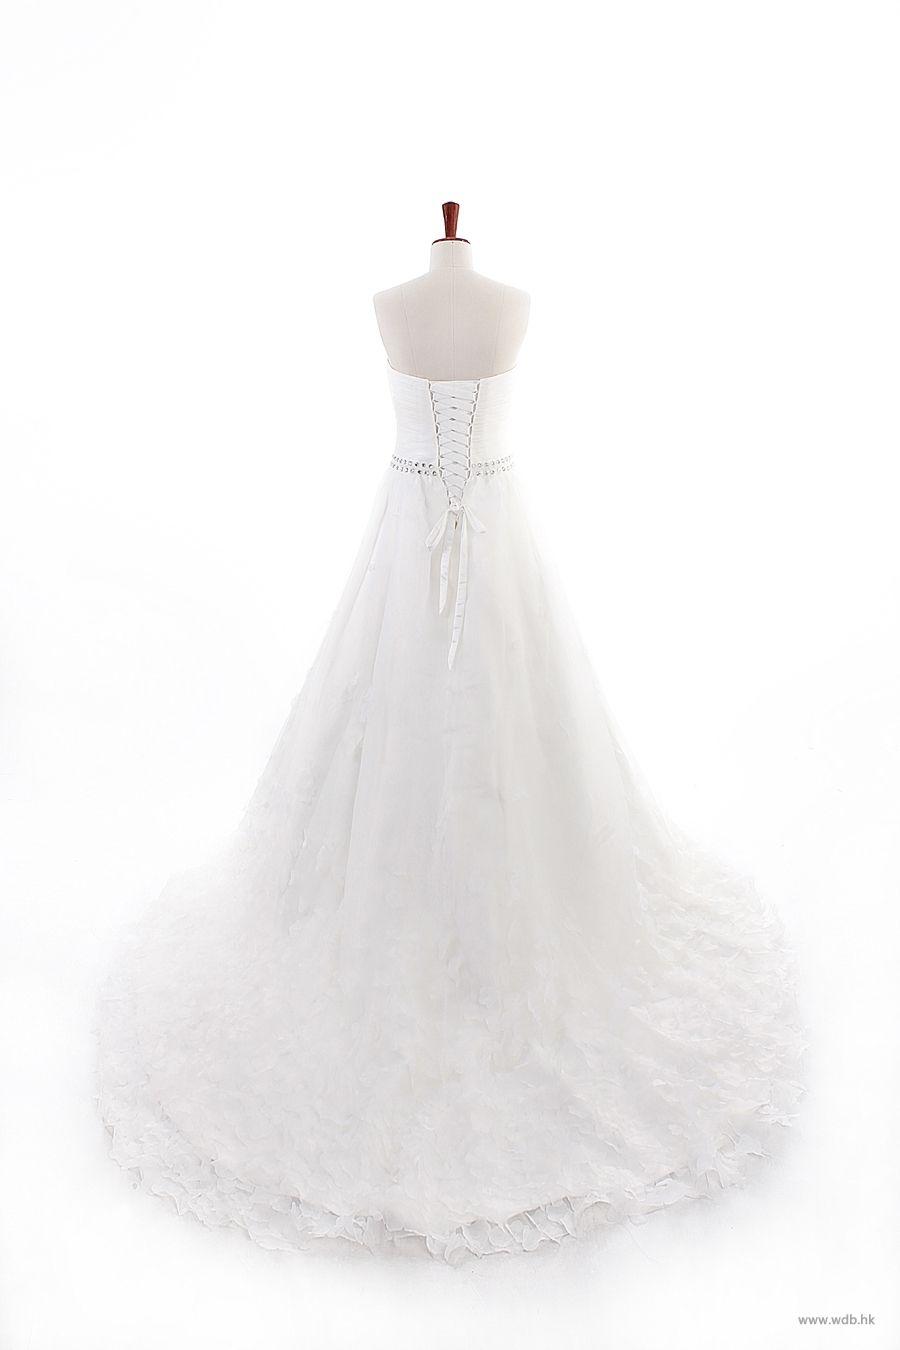 Strapless ball gown wedding dresses  garden wedding Strapless Ball Gown Net wedding dress